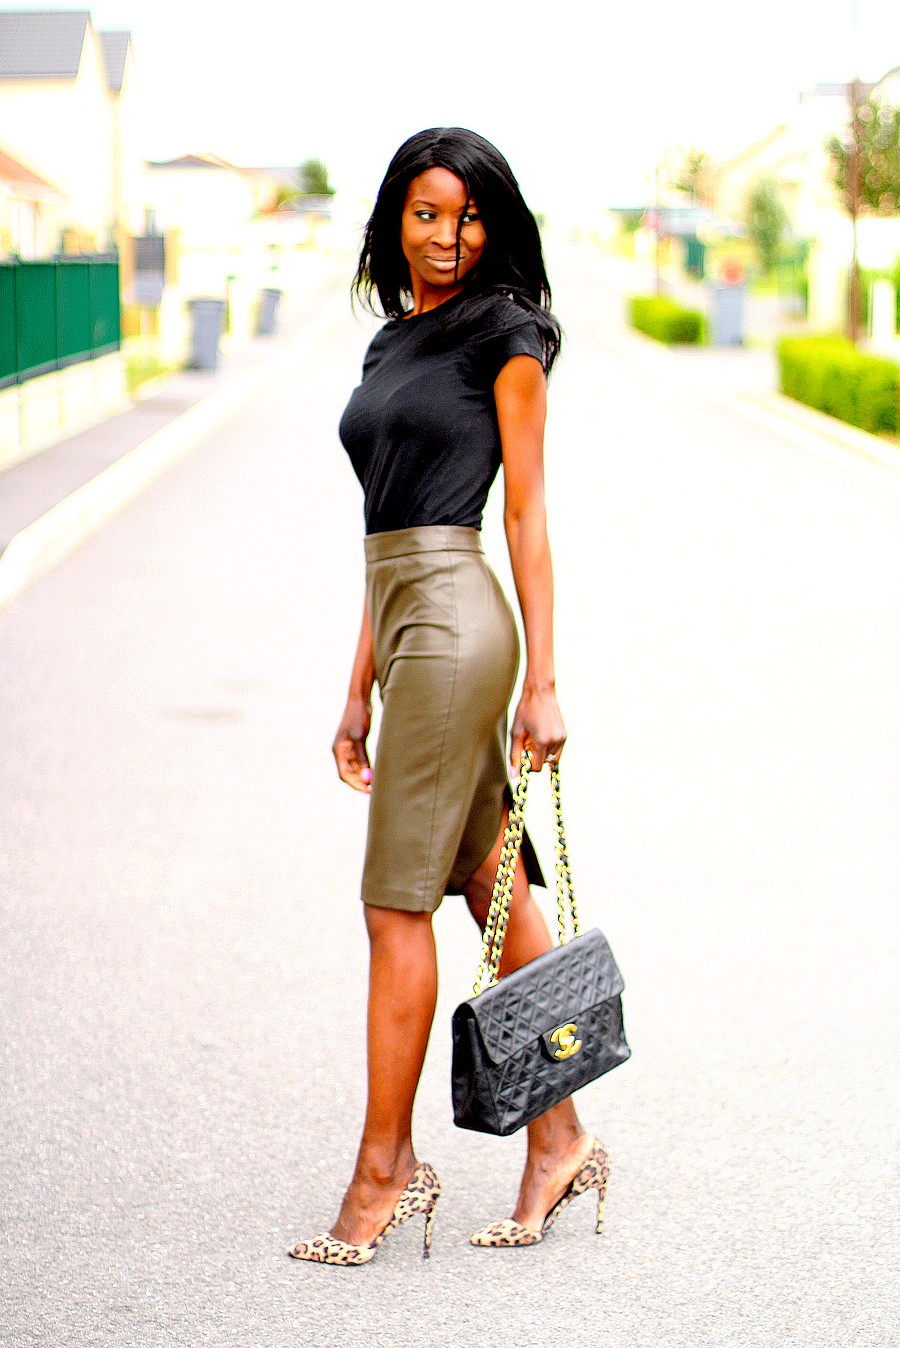 jupe-taille-haute-cuir-sac-chanel-jumbo-xl-vintage-escarpins-leopard-assitan